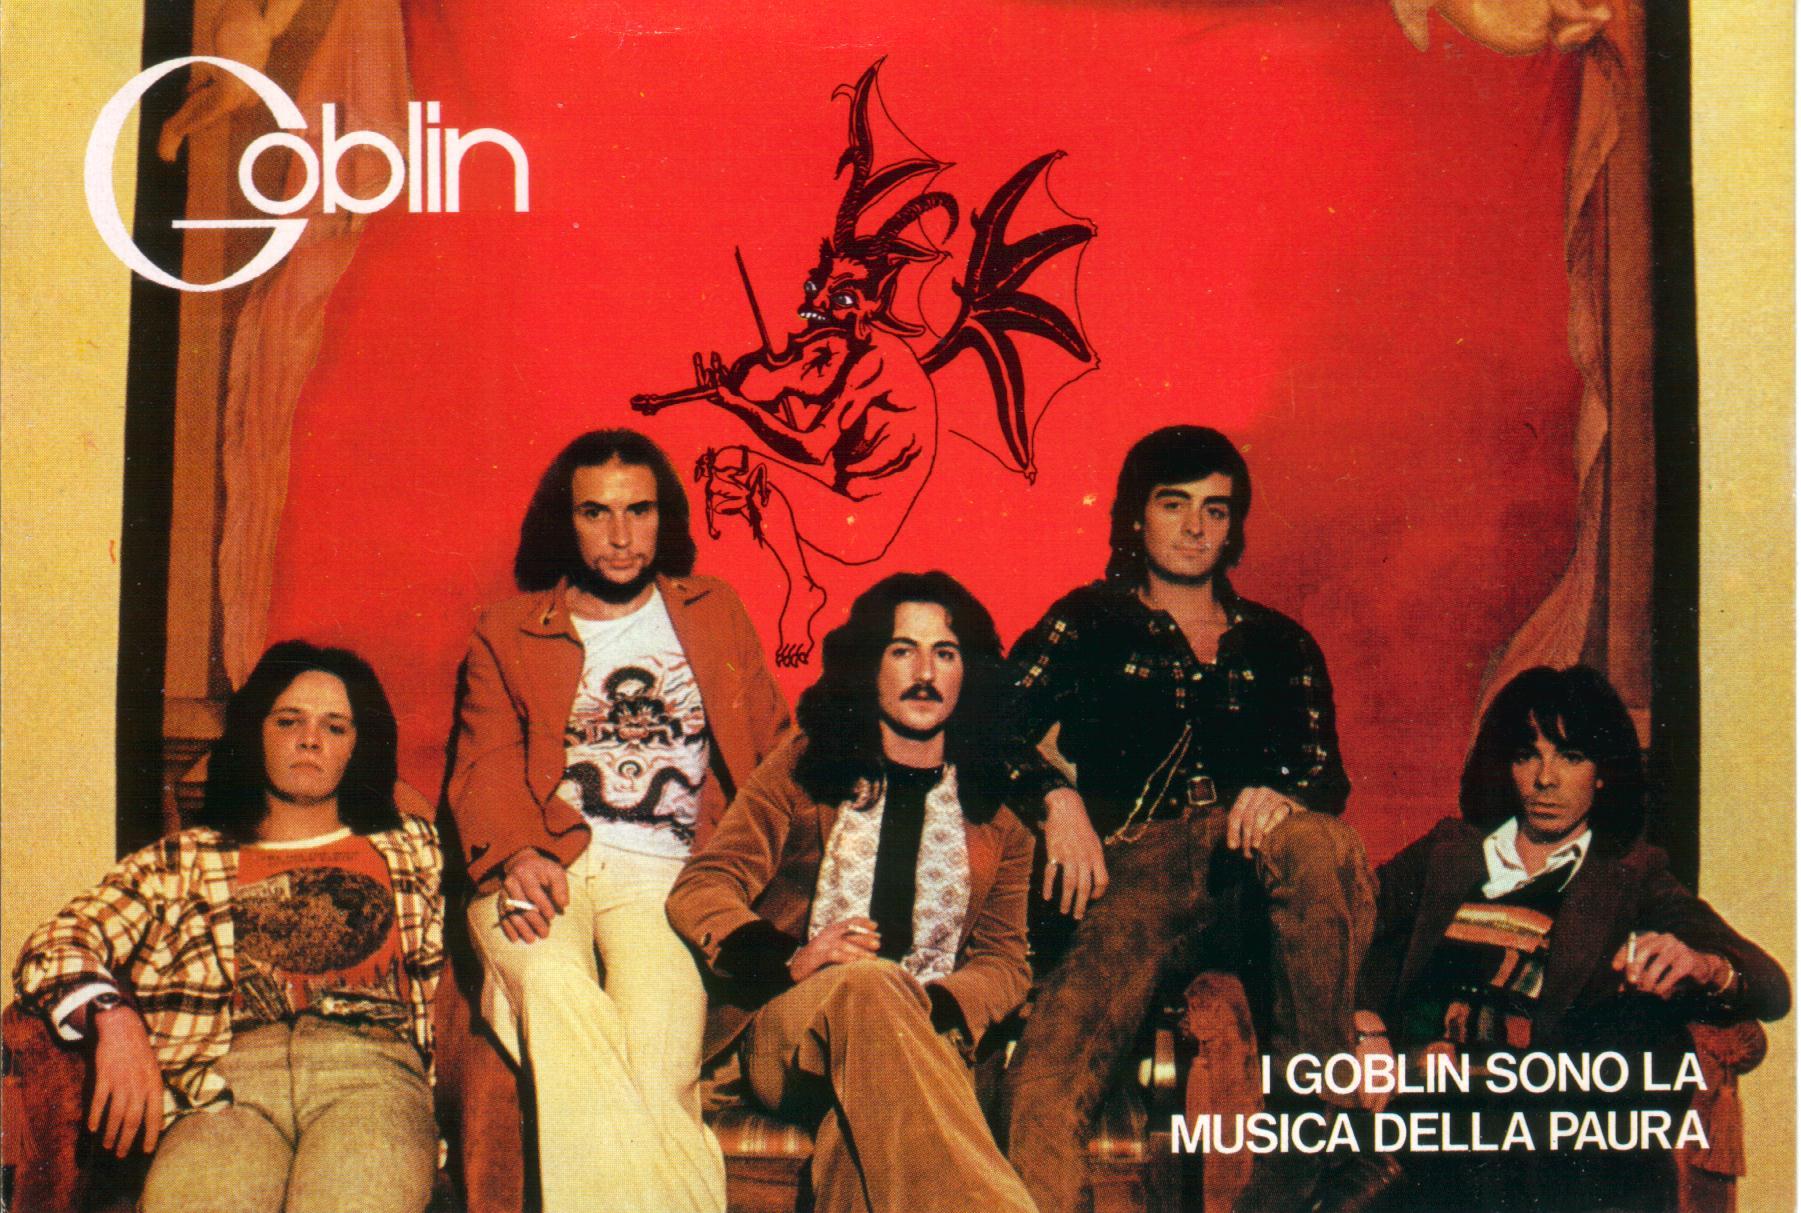 Goblin nel 1976